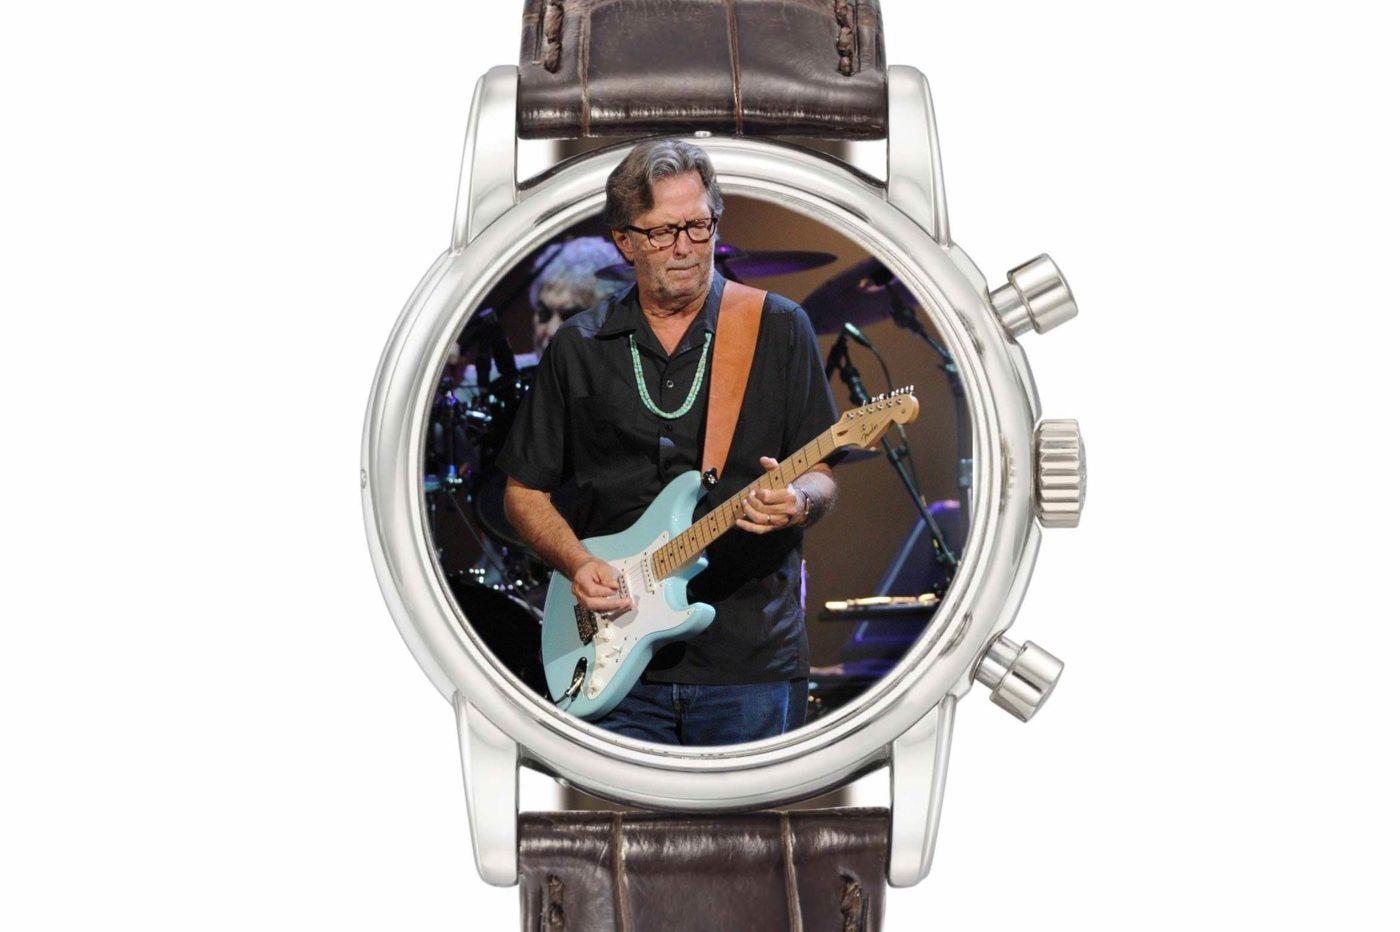 Timebloid Zegarki w showbiznesie: Eric Clapton